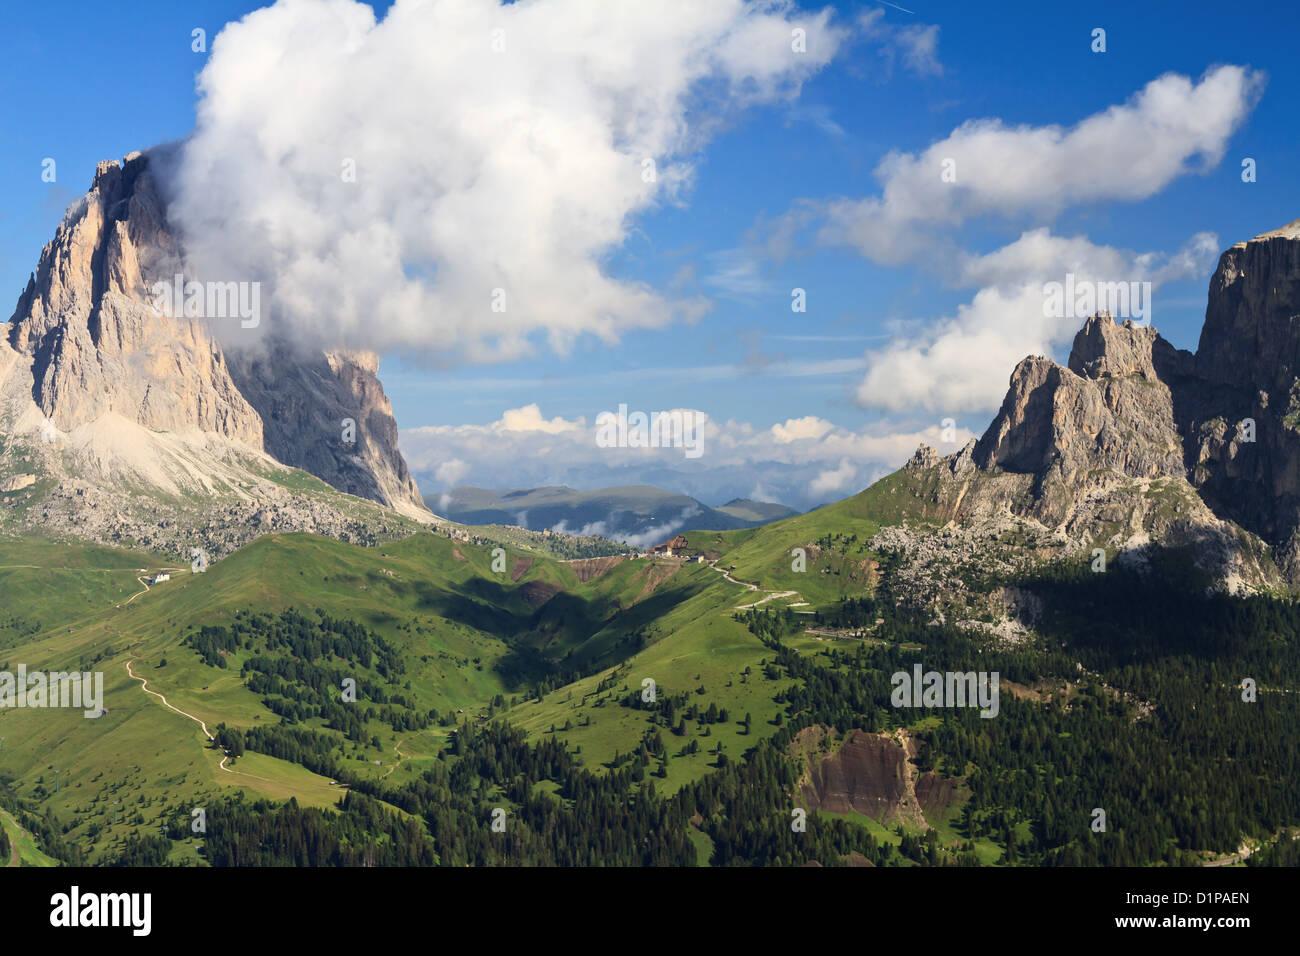 Sella pass between Gardena and Fassa valley, Italian Dolomites - Stock Image